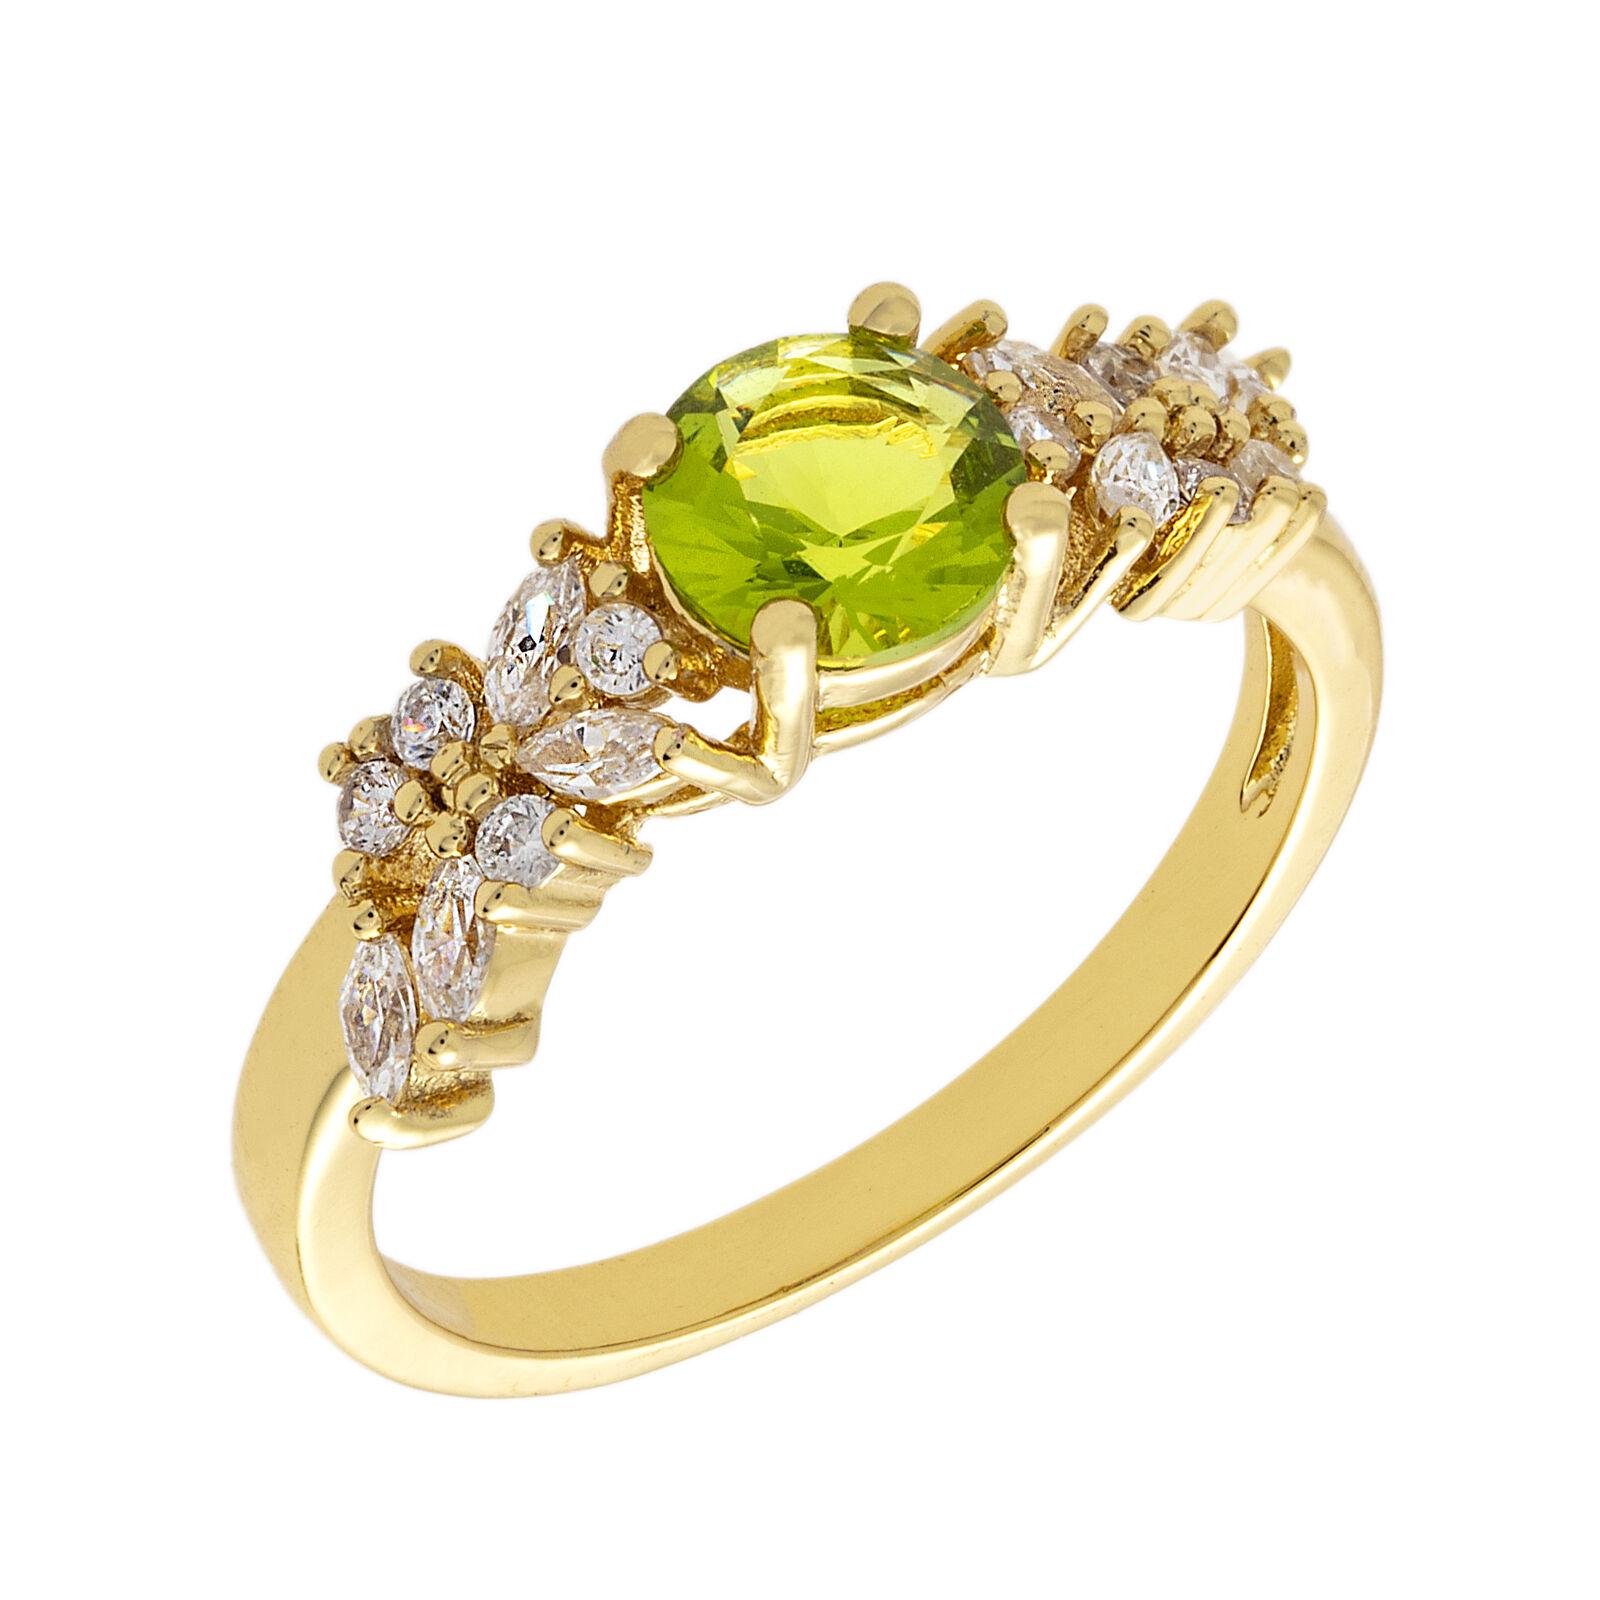 Bertha Juliet Women's 18k YG Plated Green Cluster Fashion Ring BRJ10690R7